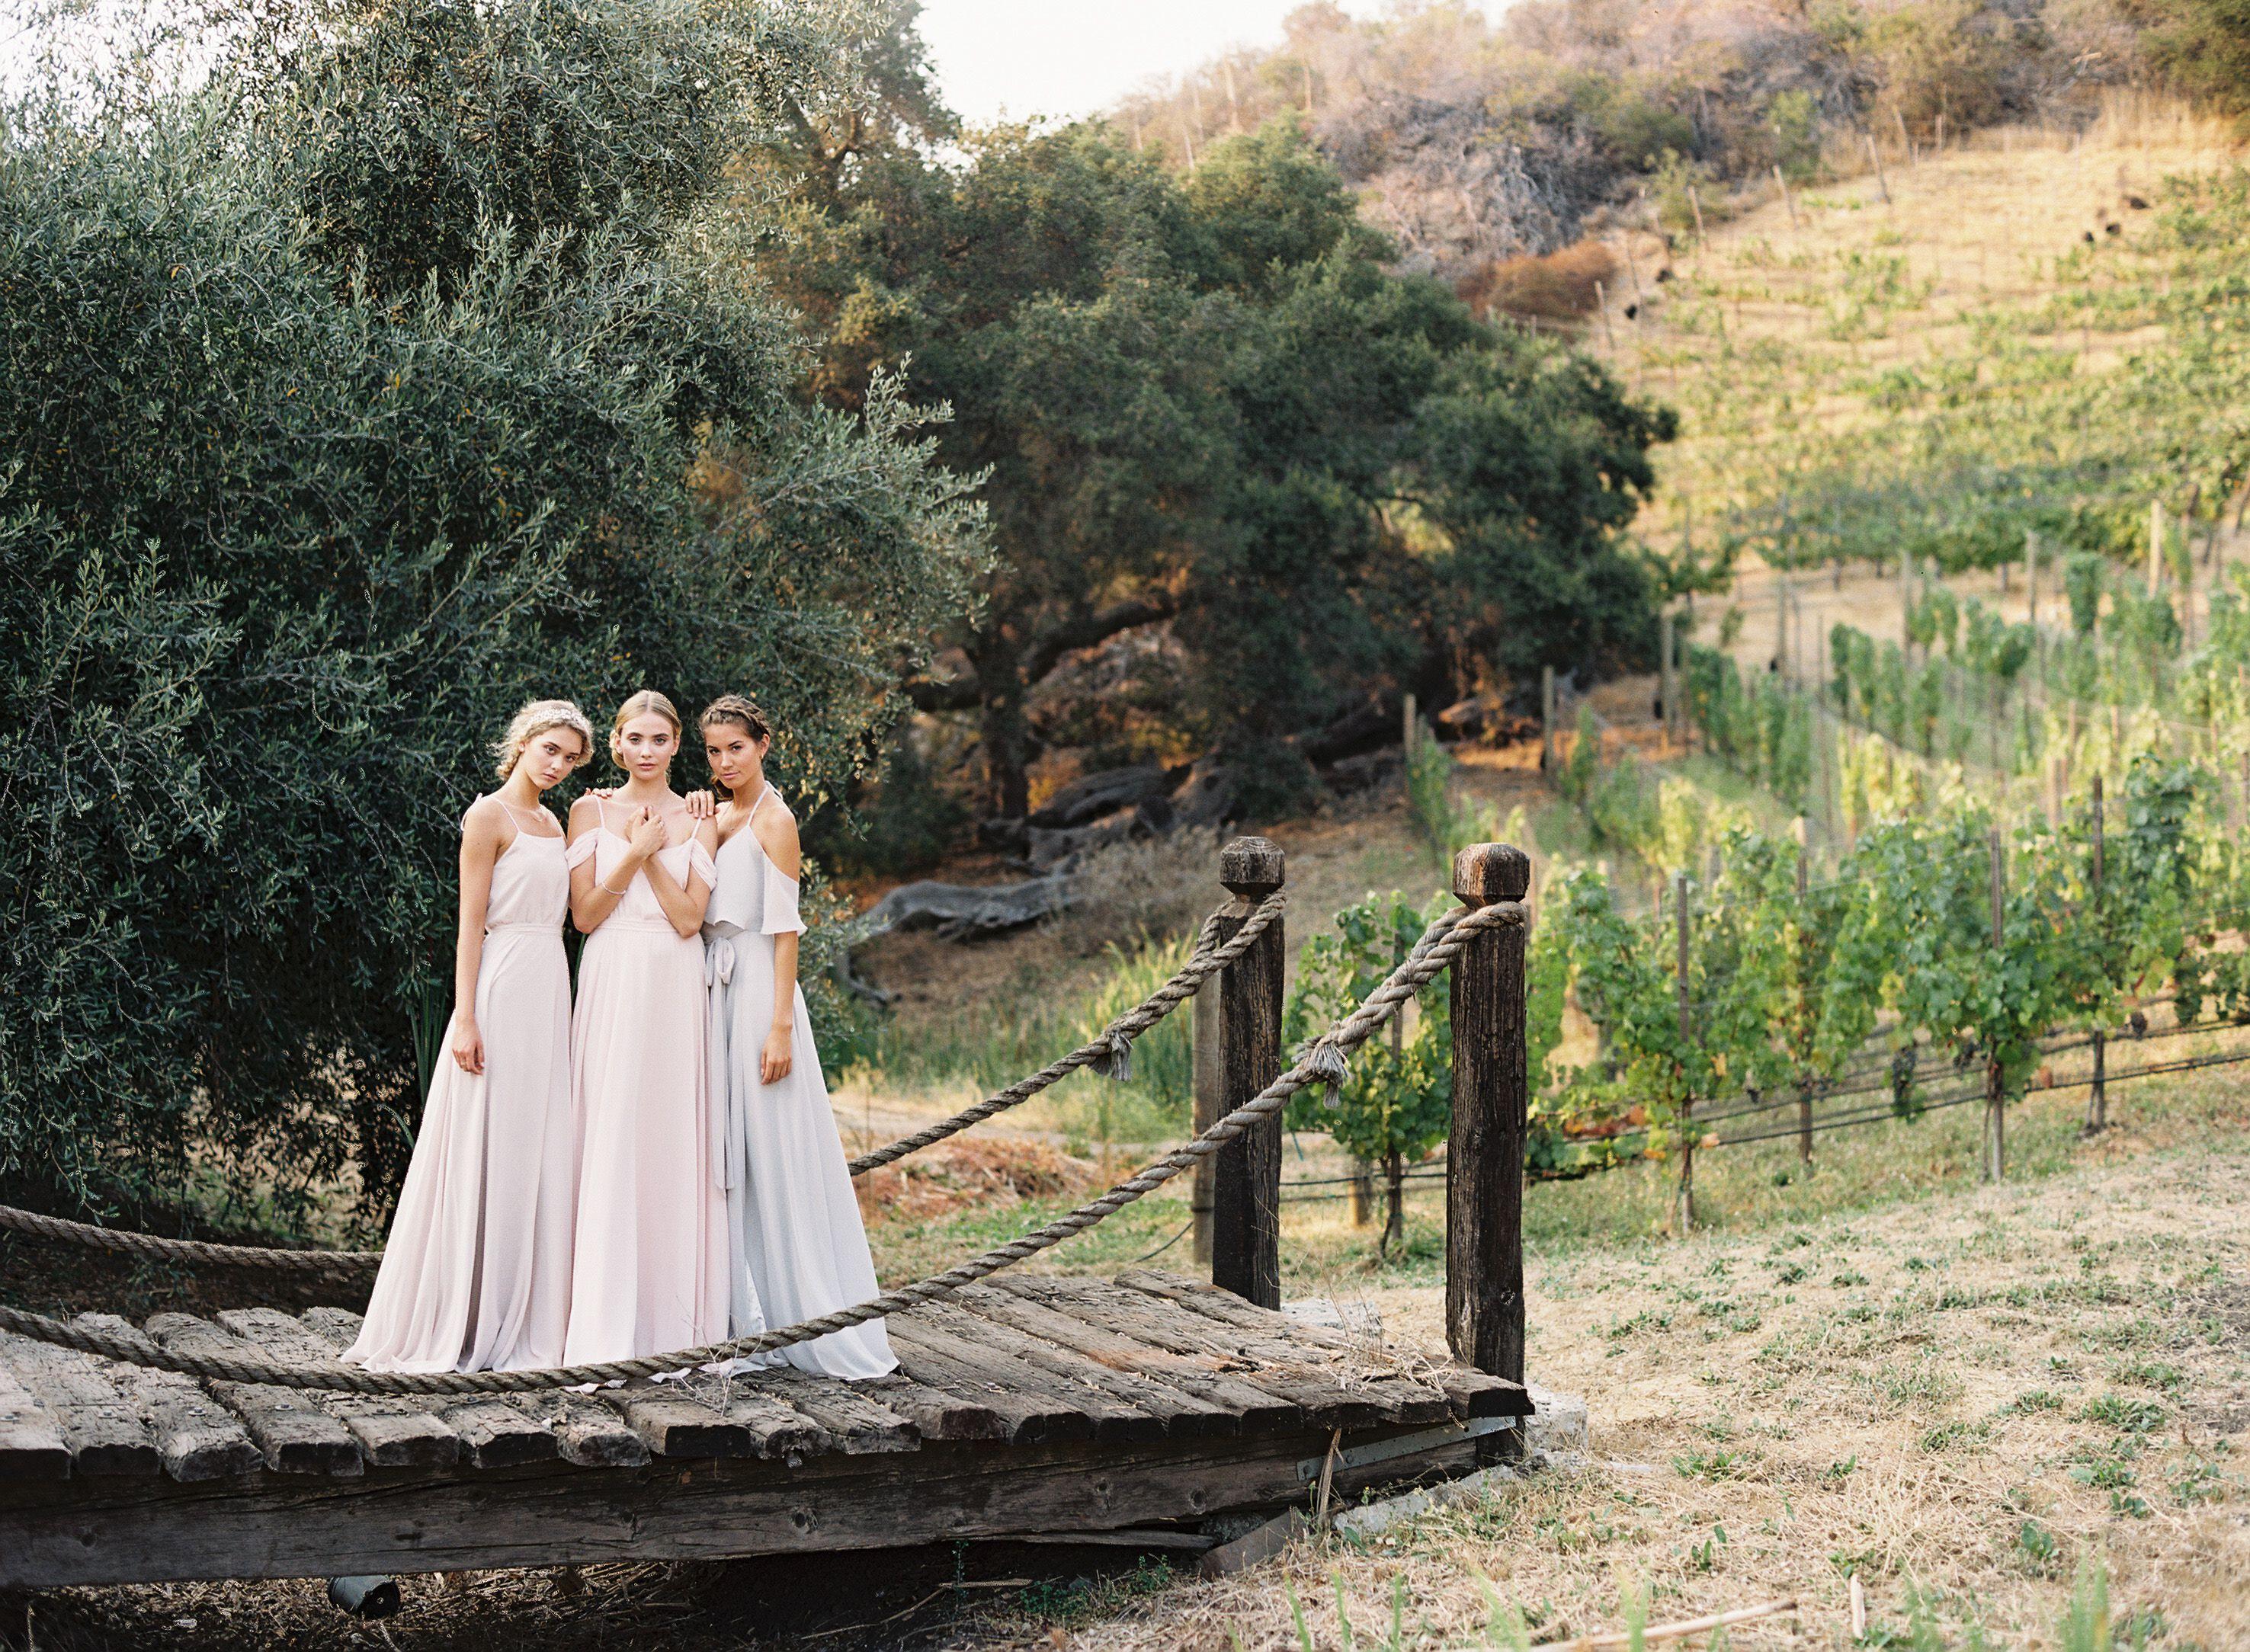 Awesome Outside Fall Wedding Ideas_11